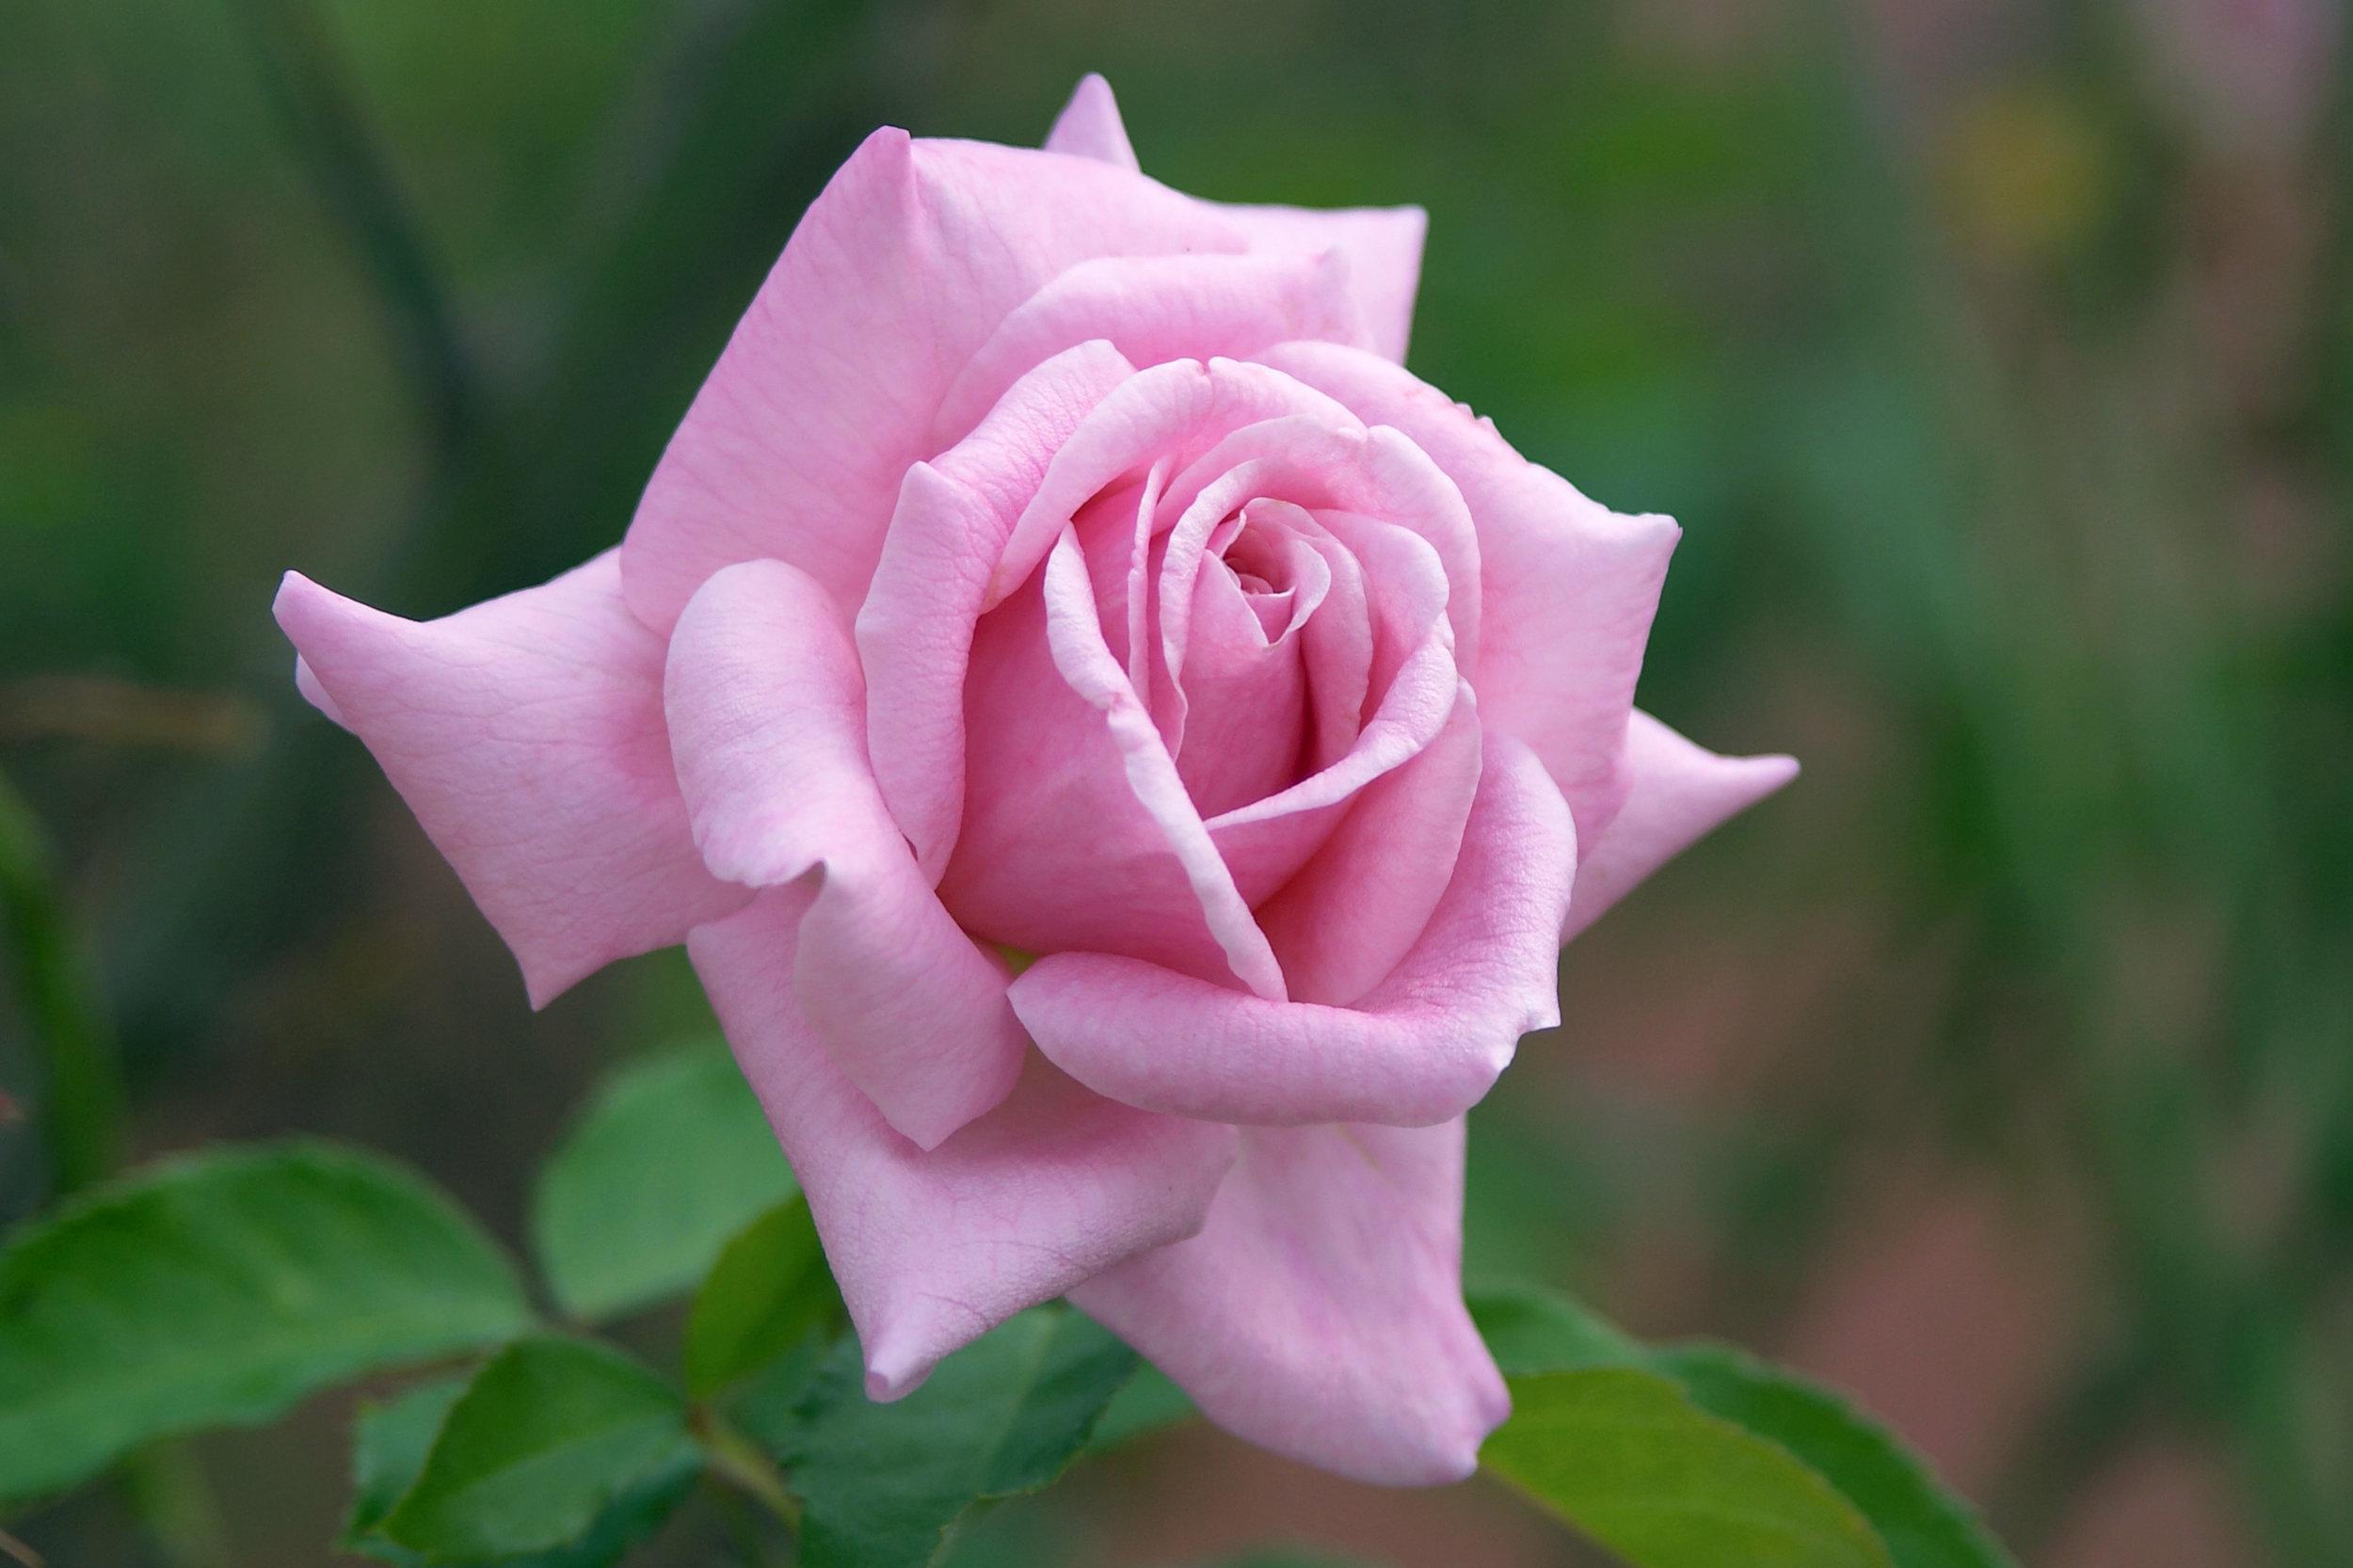 dreamstime_xxl_139025-pinkrose.jpg